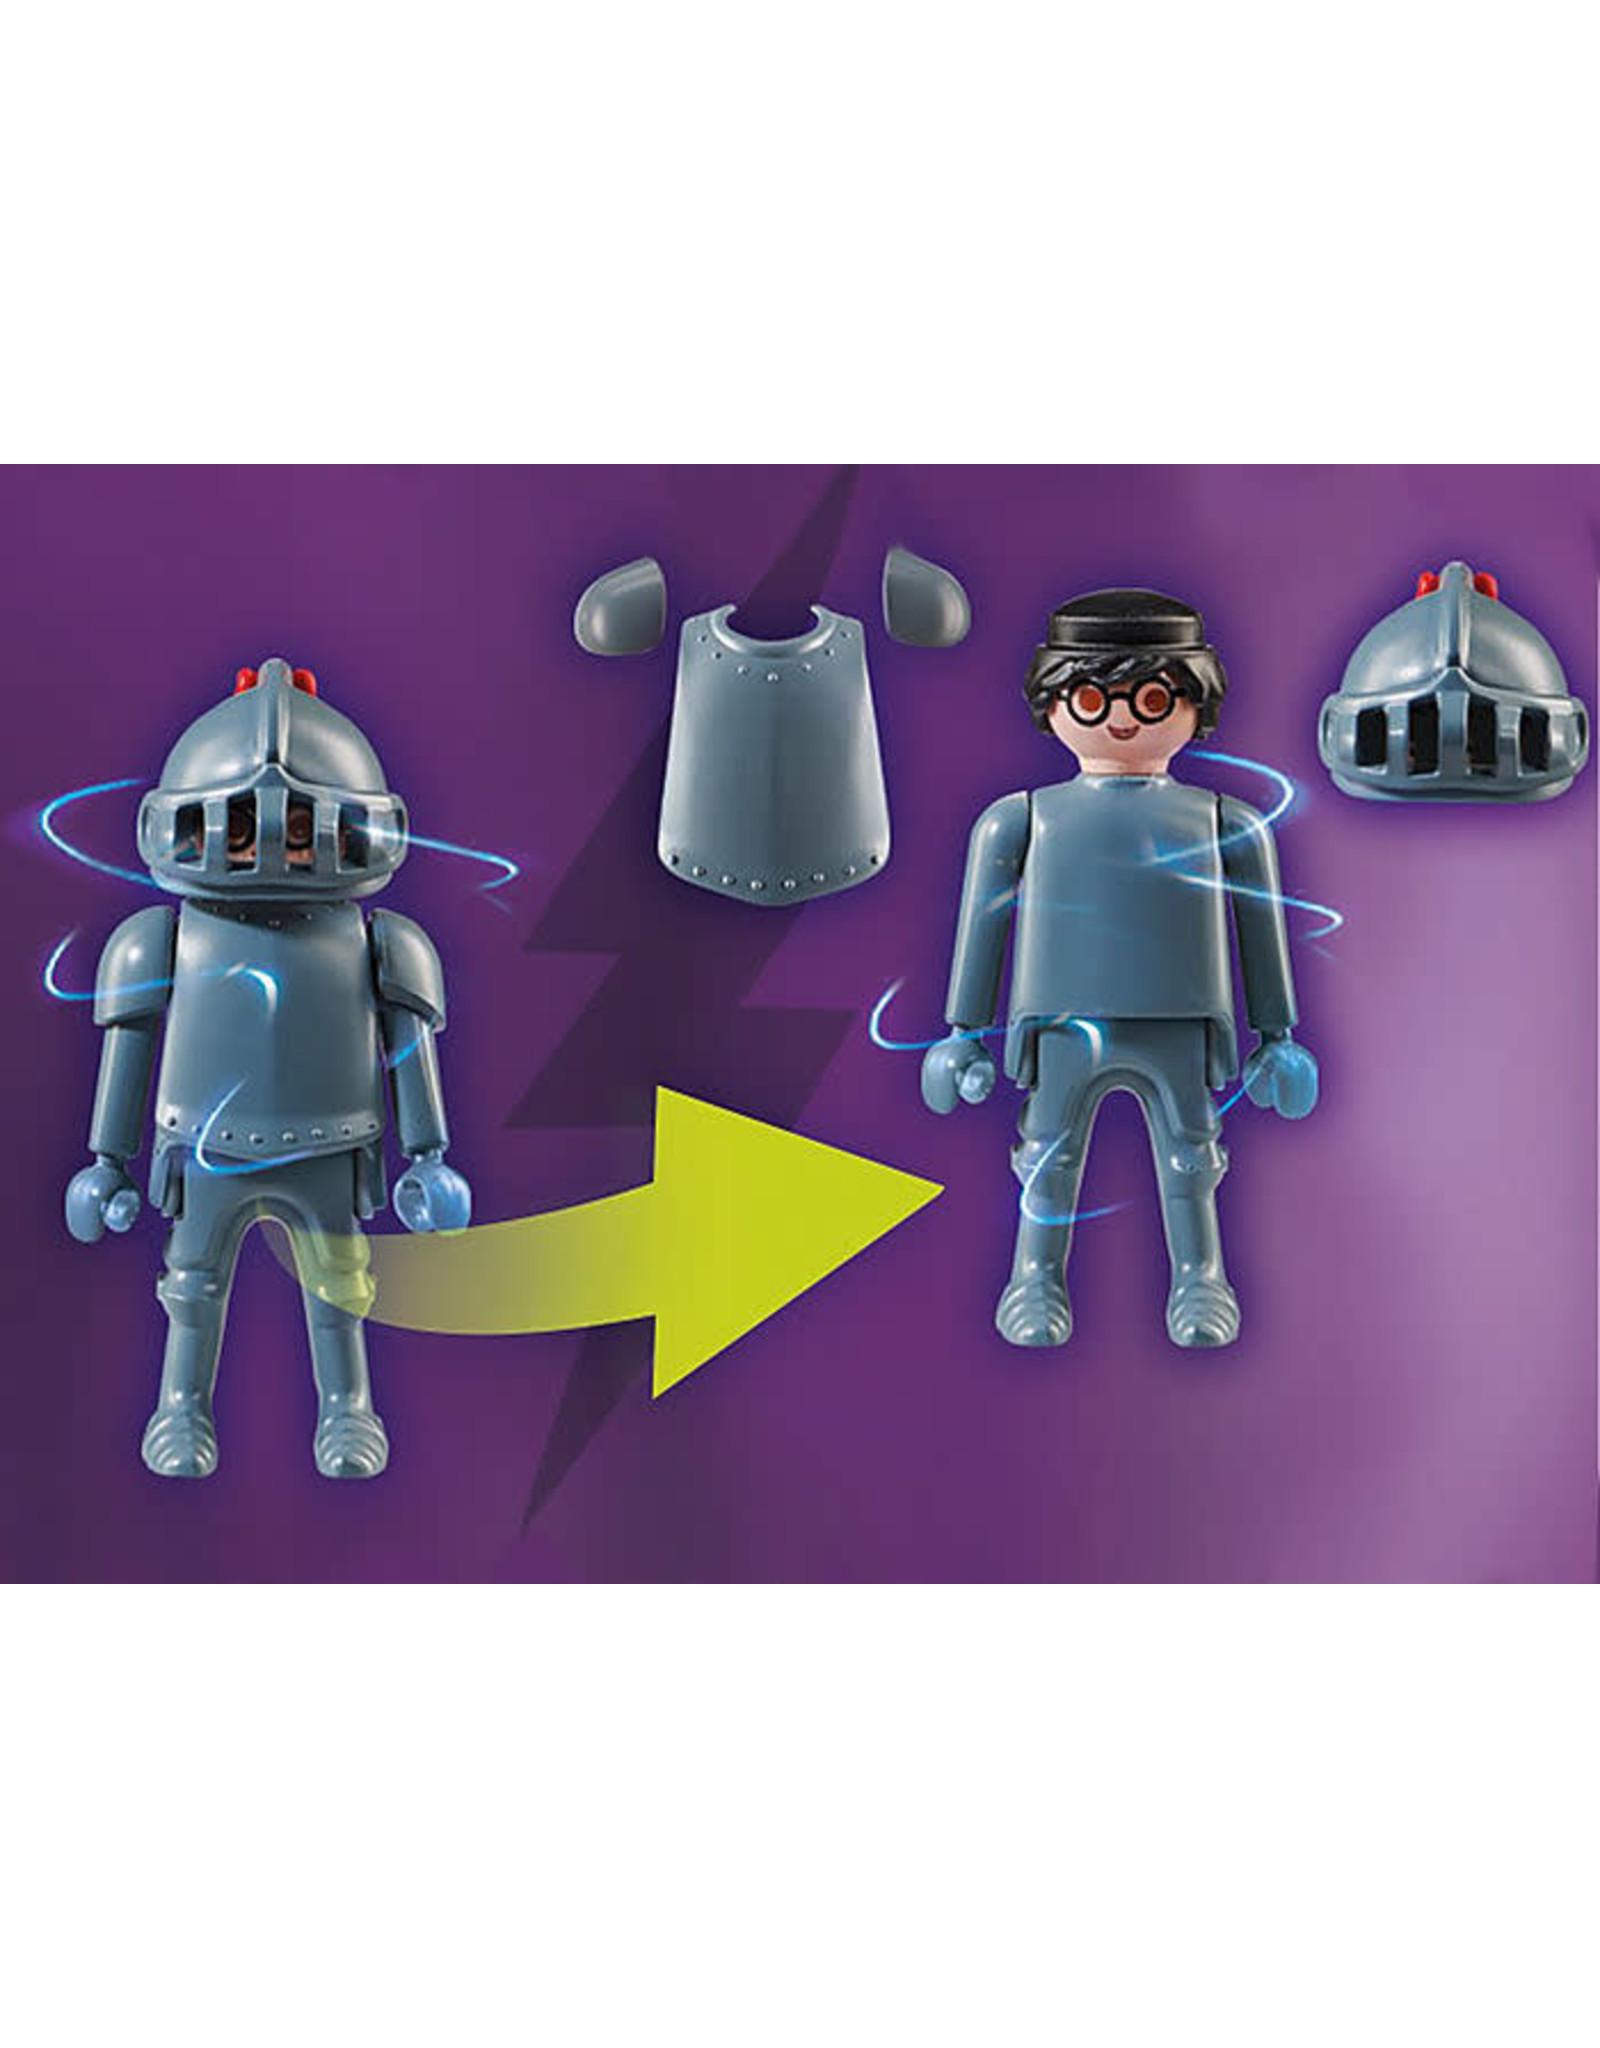 Playmobil Adventure With Black Knight